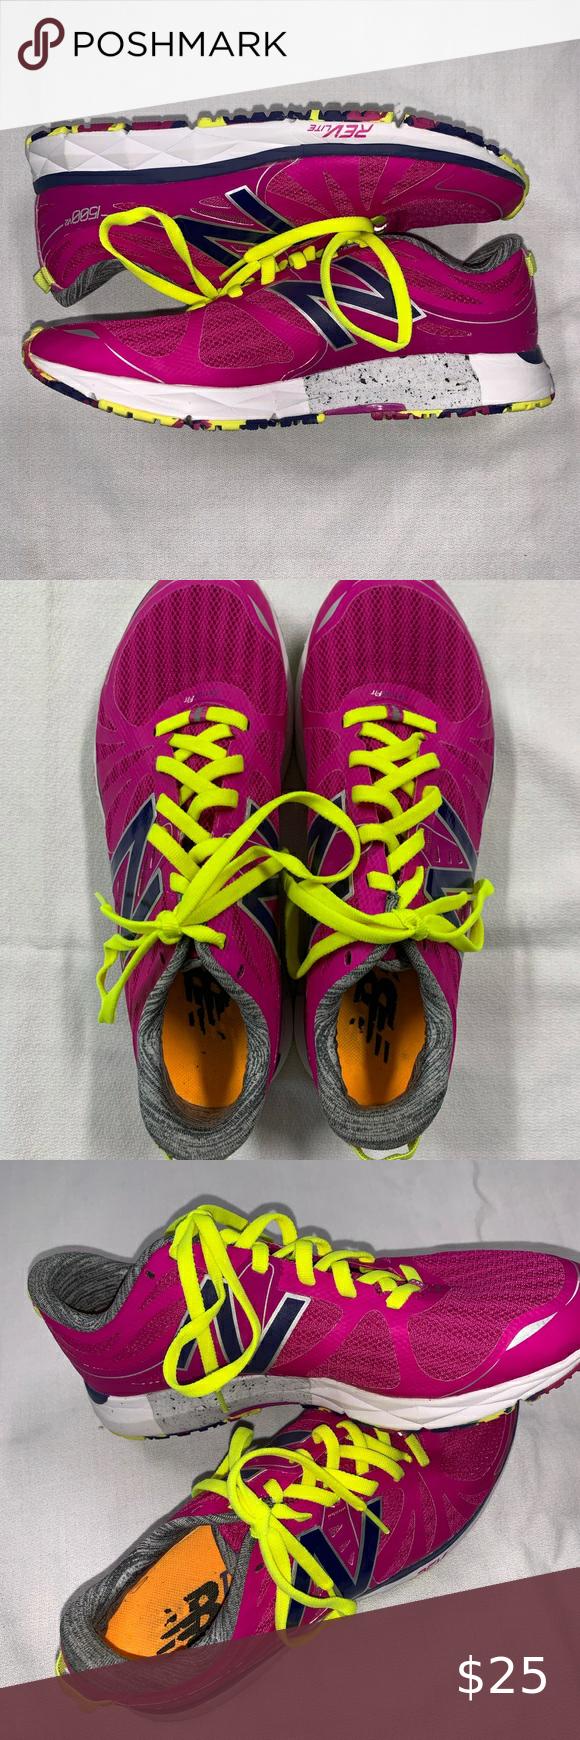 NEW BALANCE 1500v2 sneaker | New balance pink, Fuchsia color, New ...